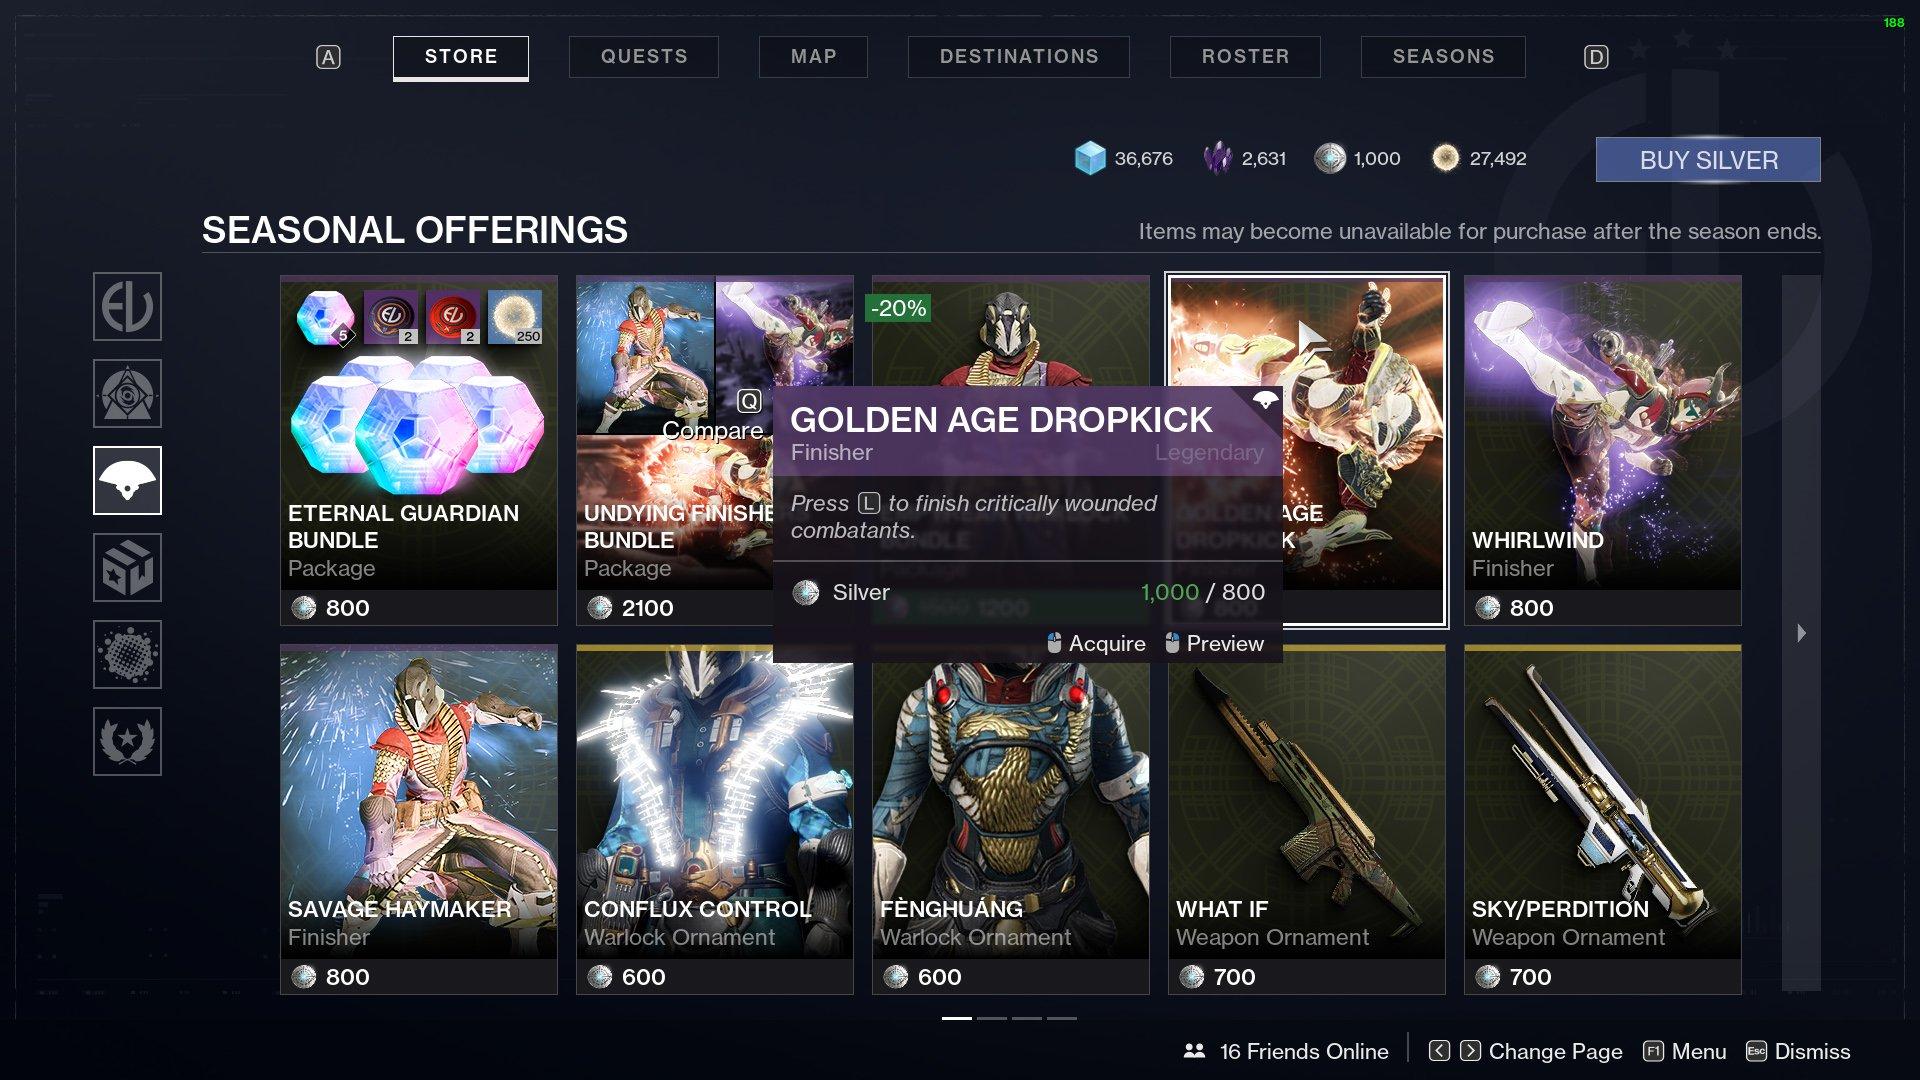 Destiny 2 Finisher Golden Age Dropkick